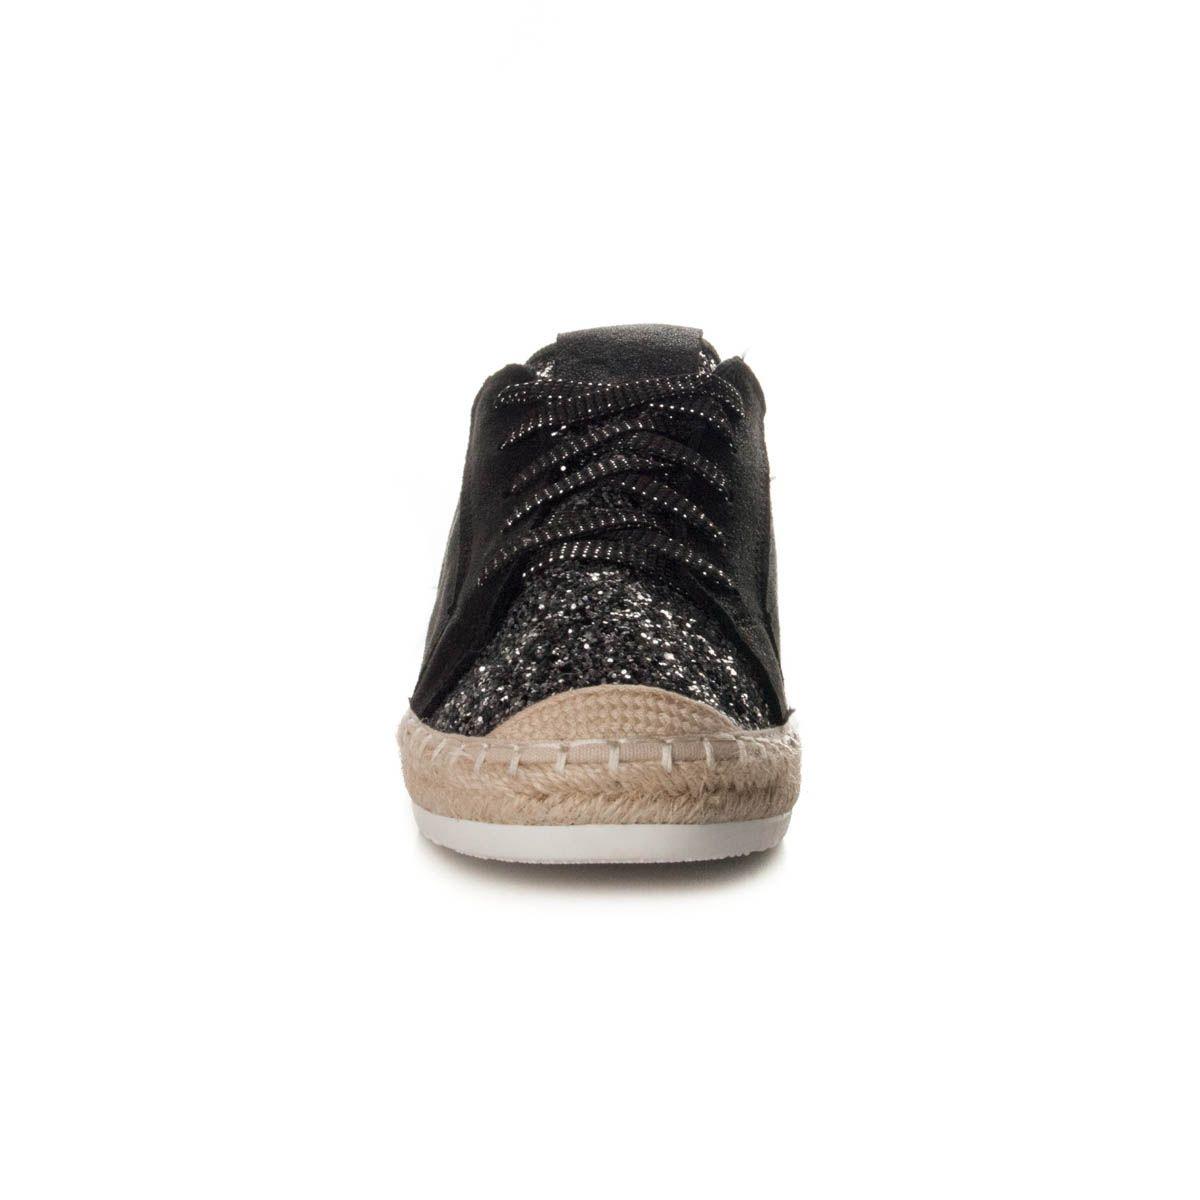 Montevita Wedge Sandal in Black